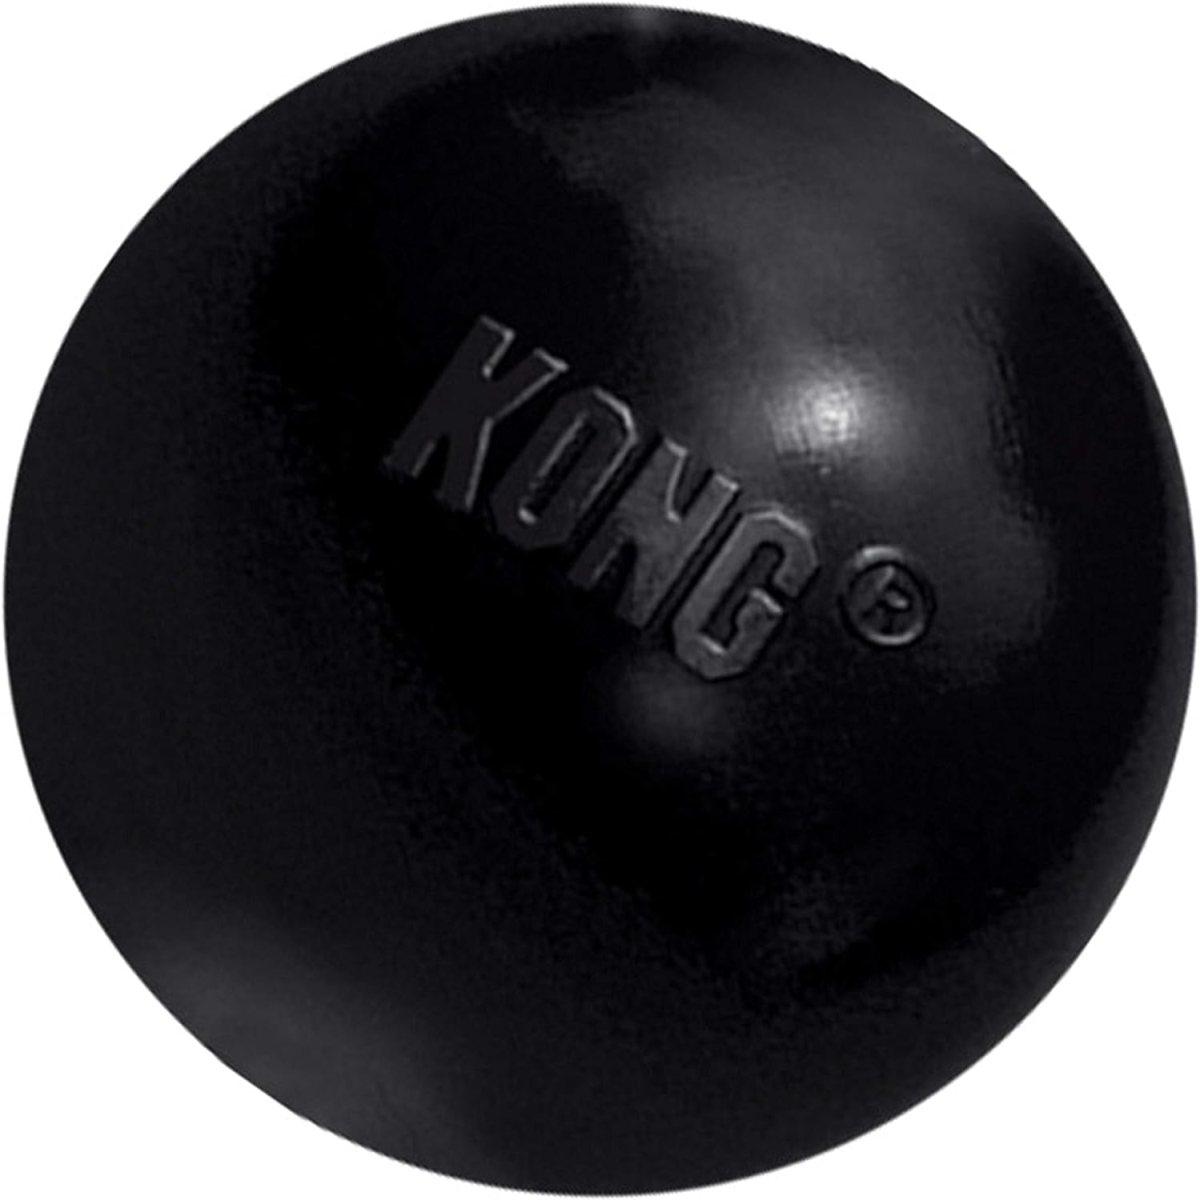 KONG - Extreme Ball - Juguete de caucho para mandíbulas potentes, negro - Raza mediana/grande